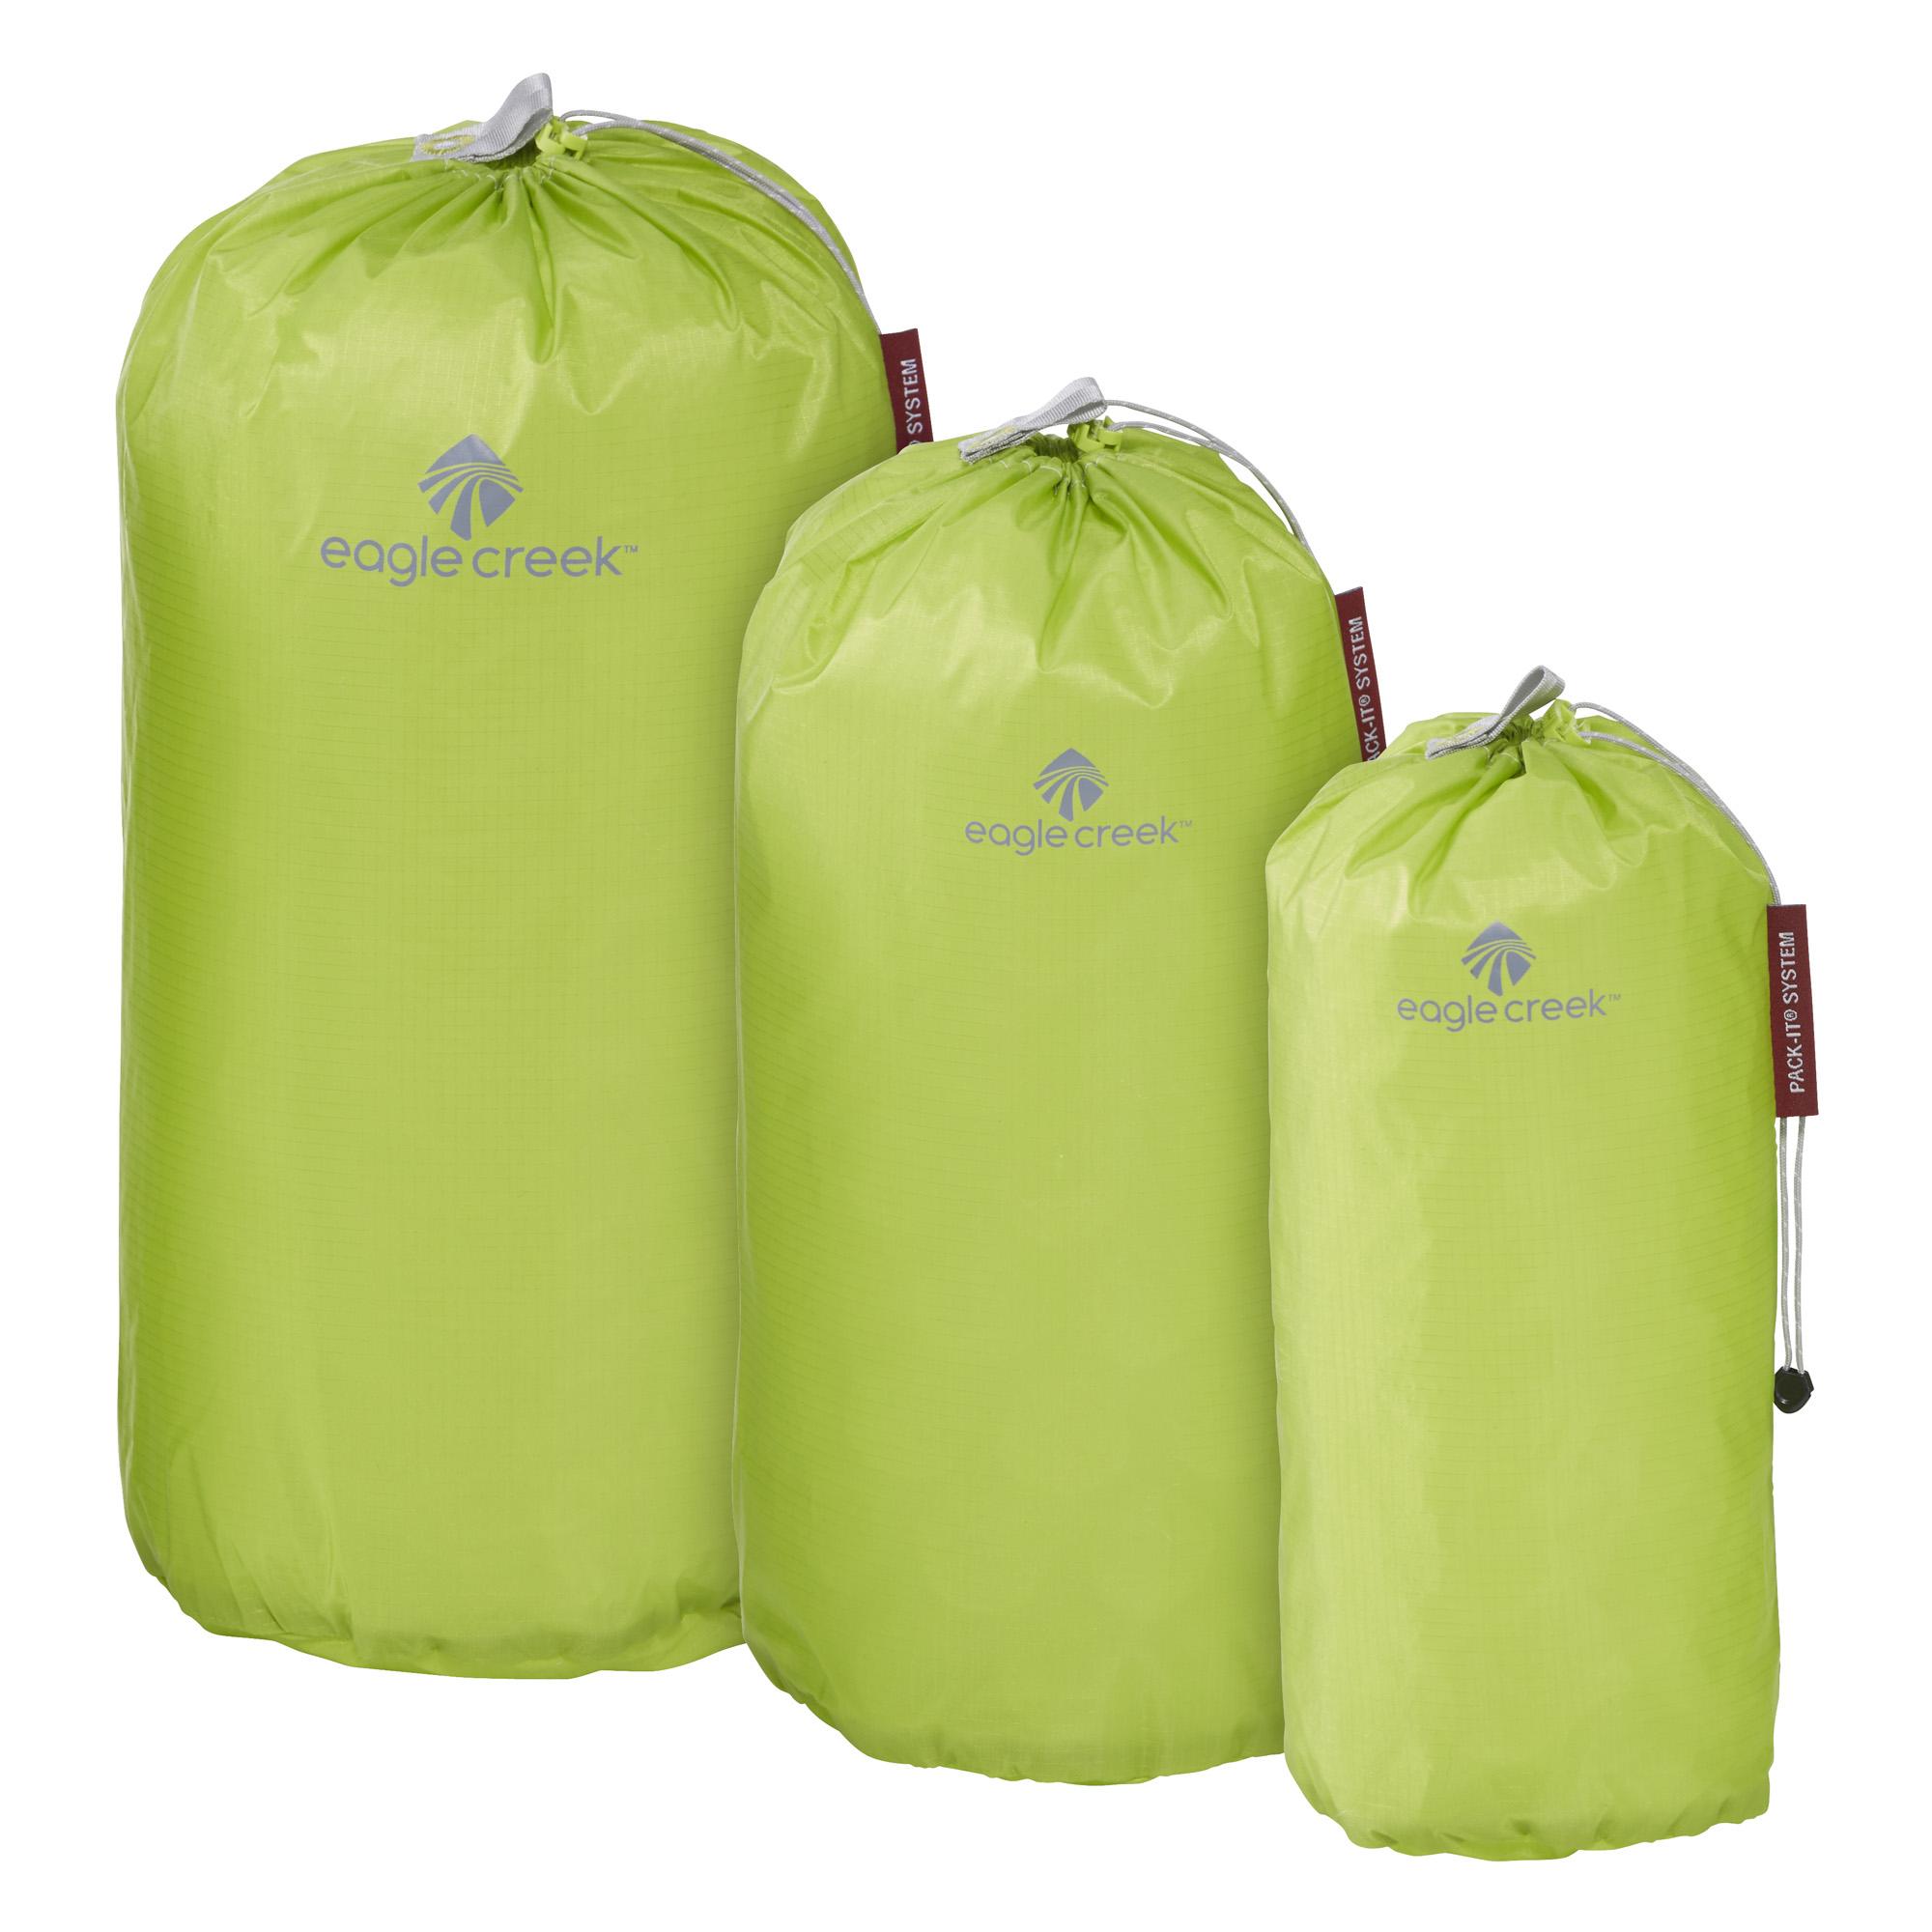 Pack-It Specter Stuffer Set S/M/L - Strobe Green